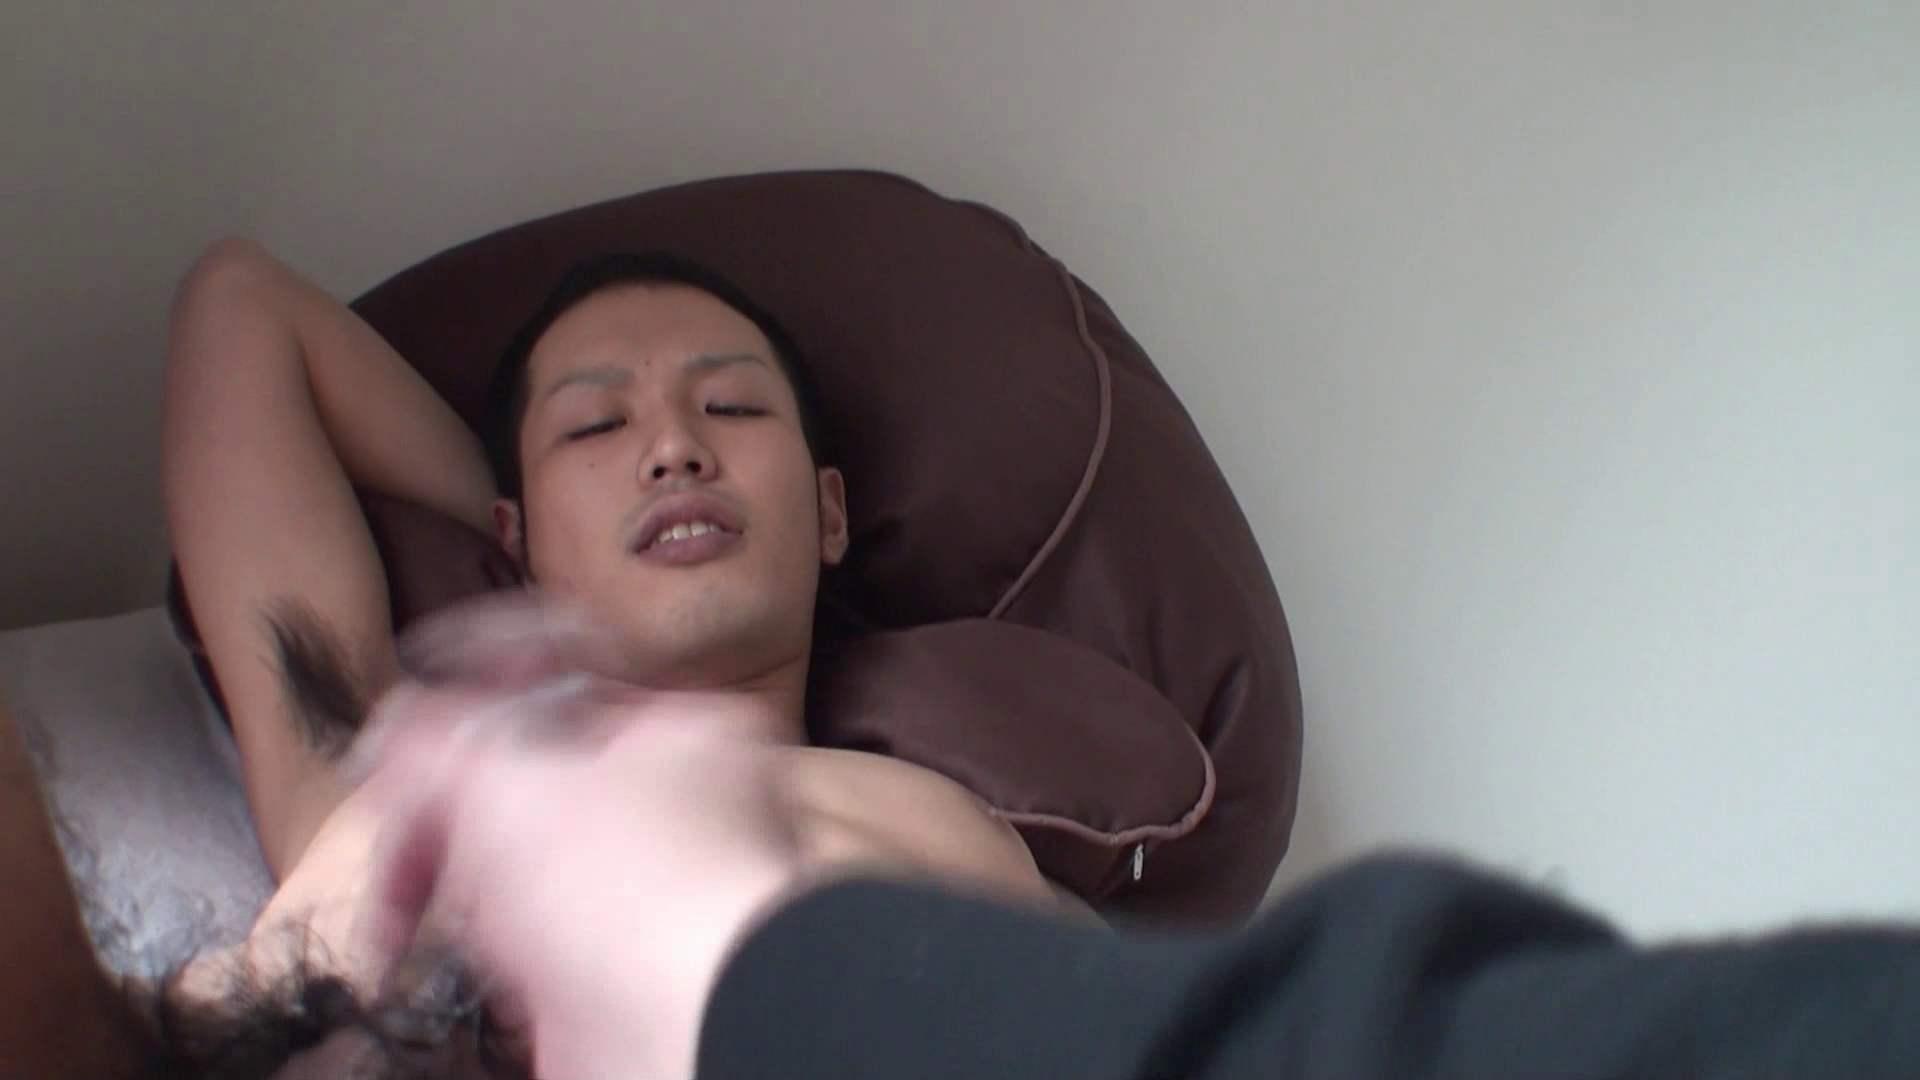 HD 良太と健二当たり前の日常 セックス編 男天国 | サル系ボーイズ  50pic 7